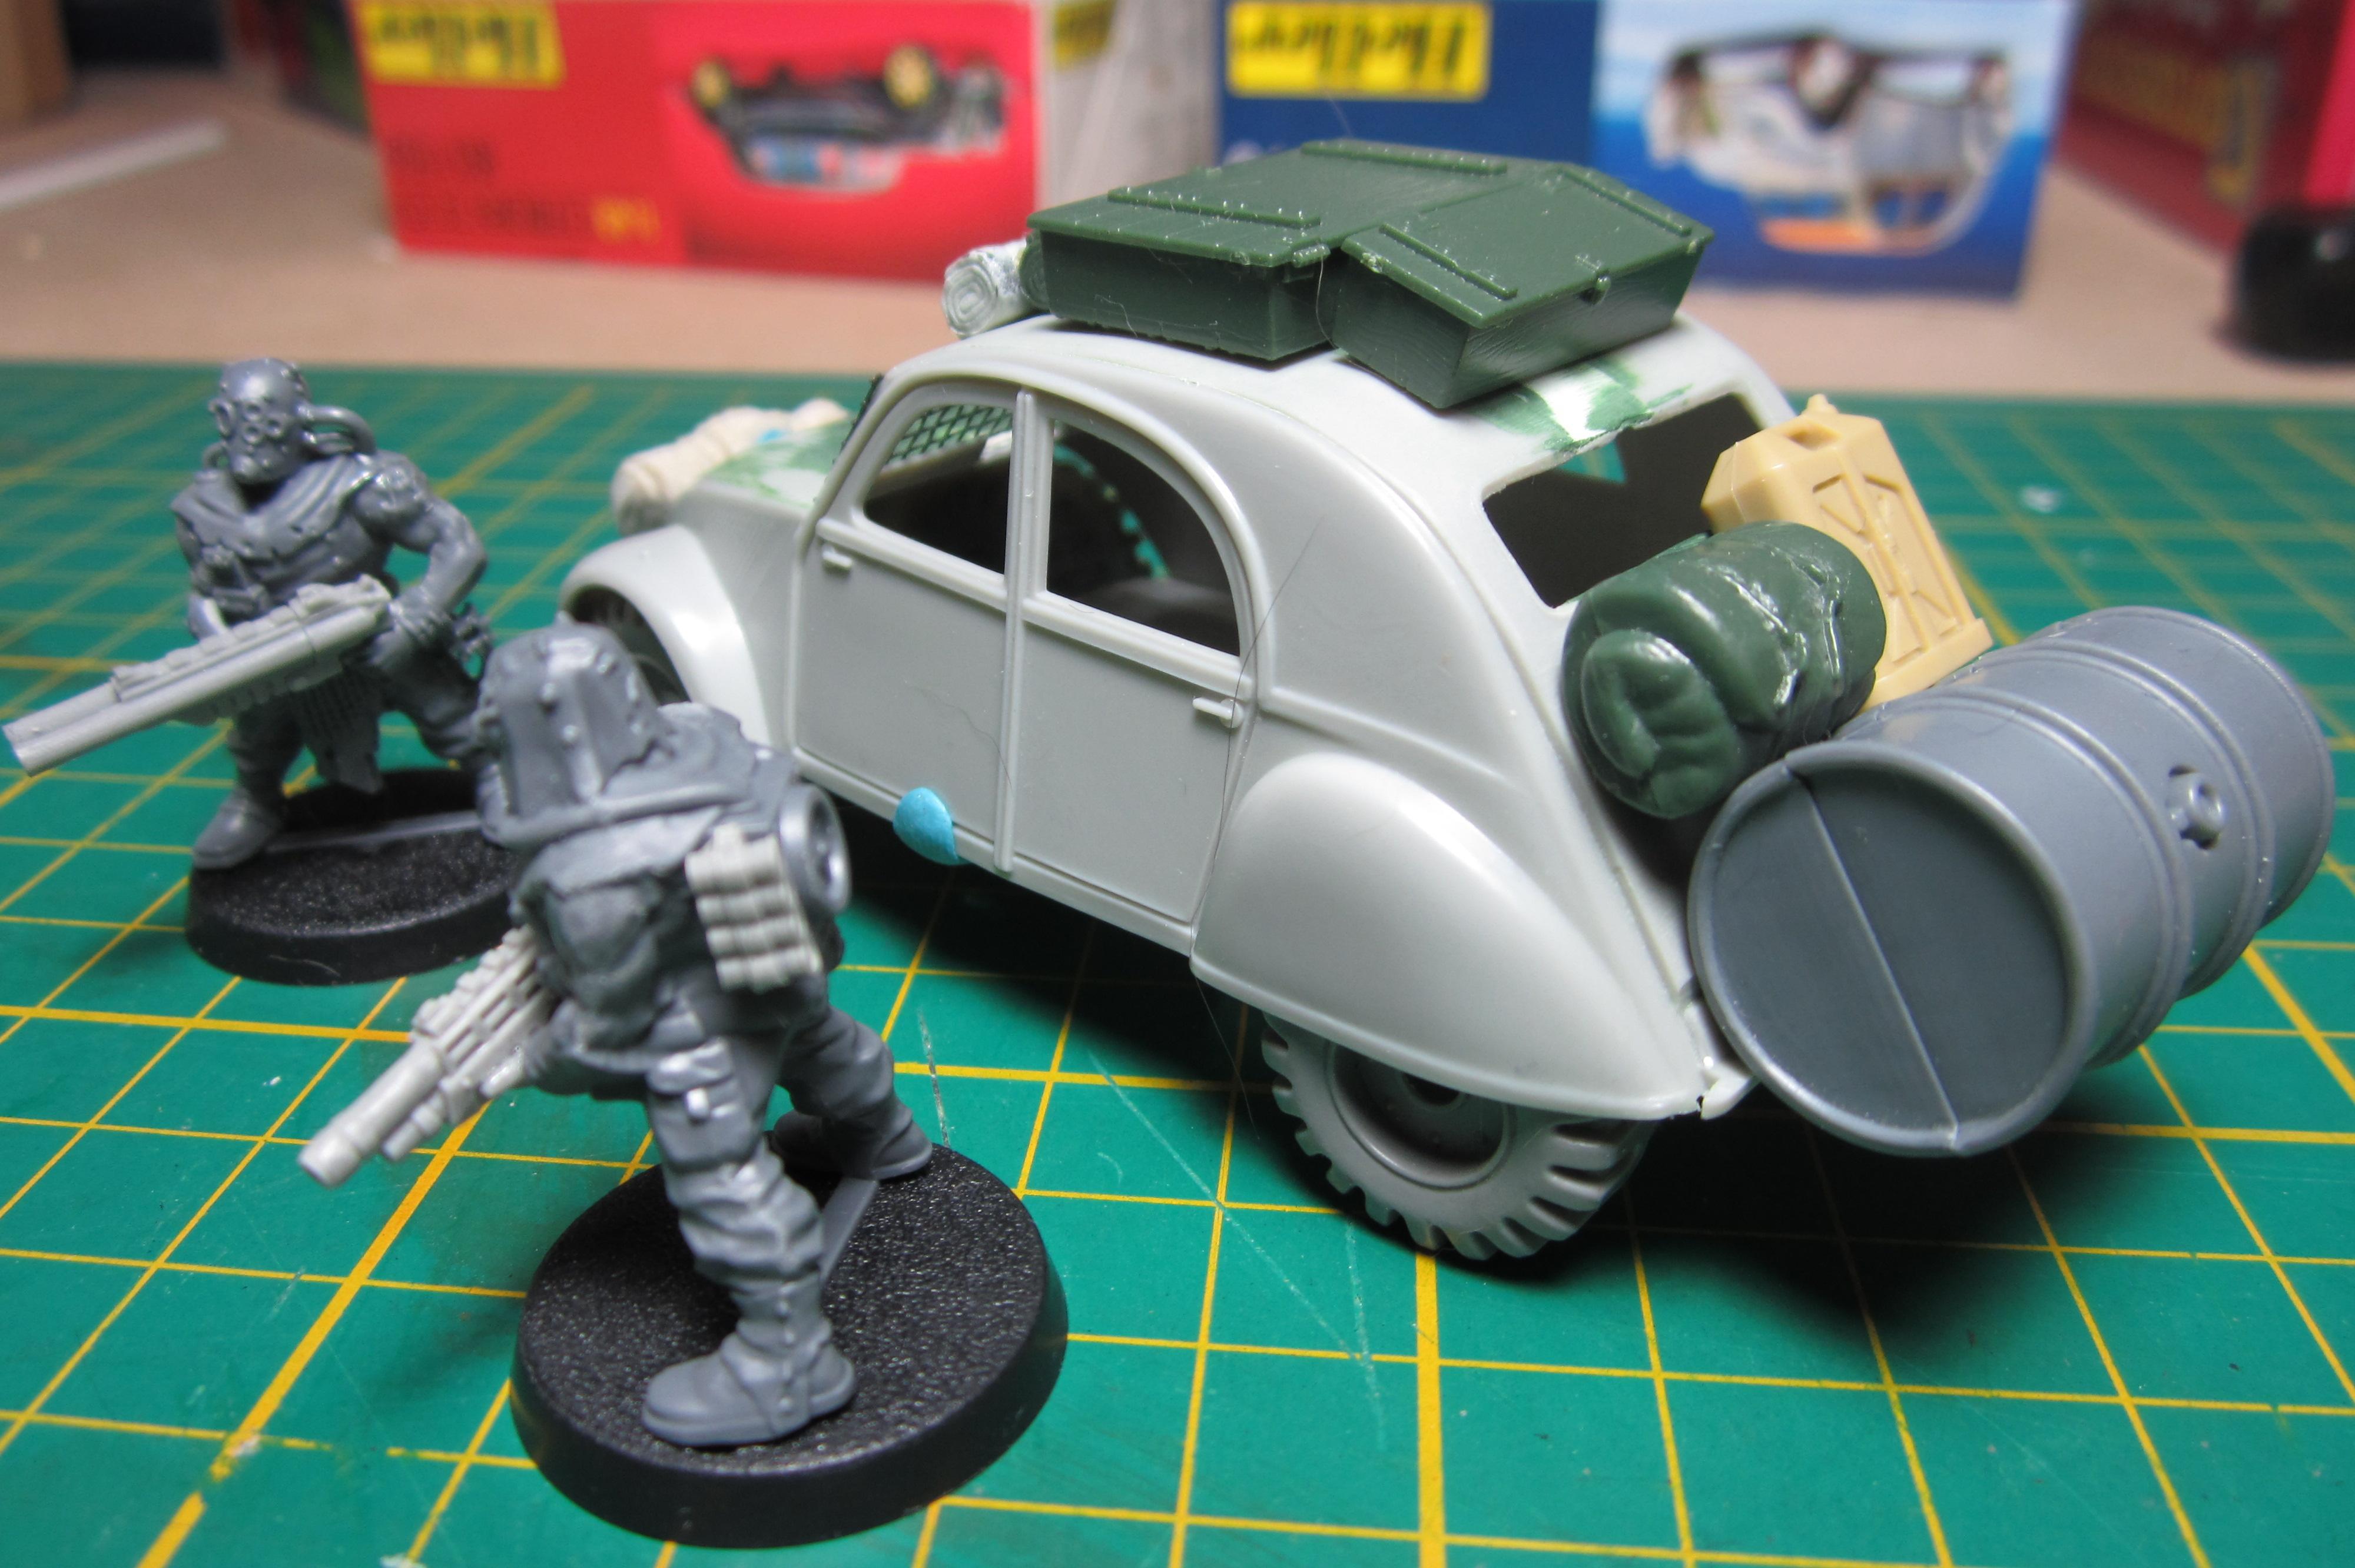 Cars, Civilian, Conversion, Gorka Morka, Imperial, Iom, Vehicle, Warhammer 40,000